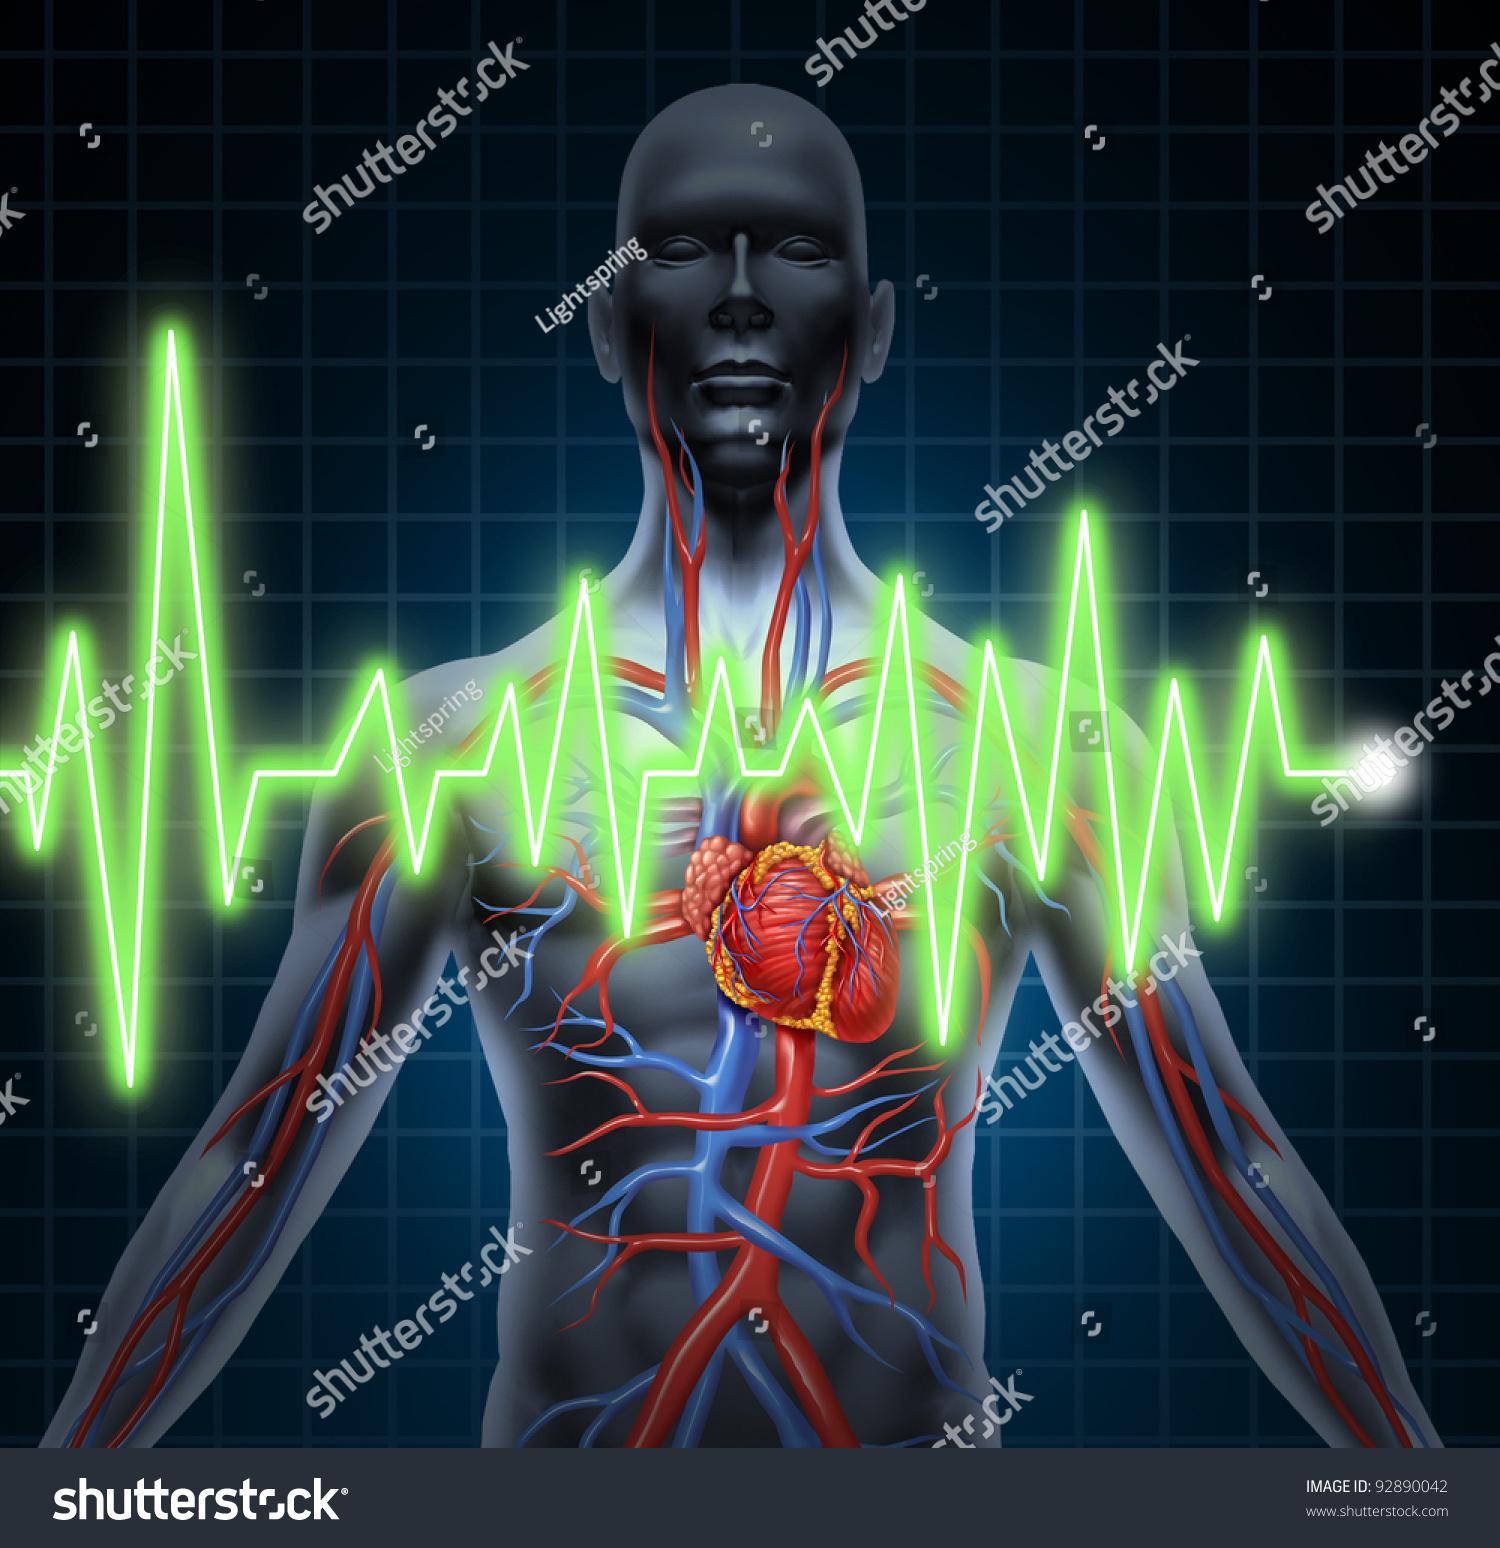 Cardiovascular Monitoring System : Ecg and ekg cardiovascular system monitoring with heart